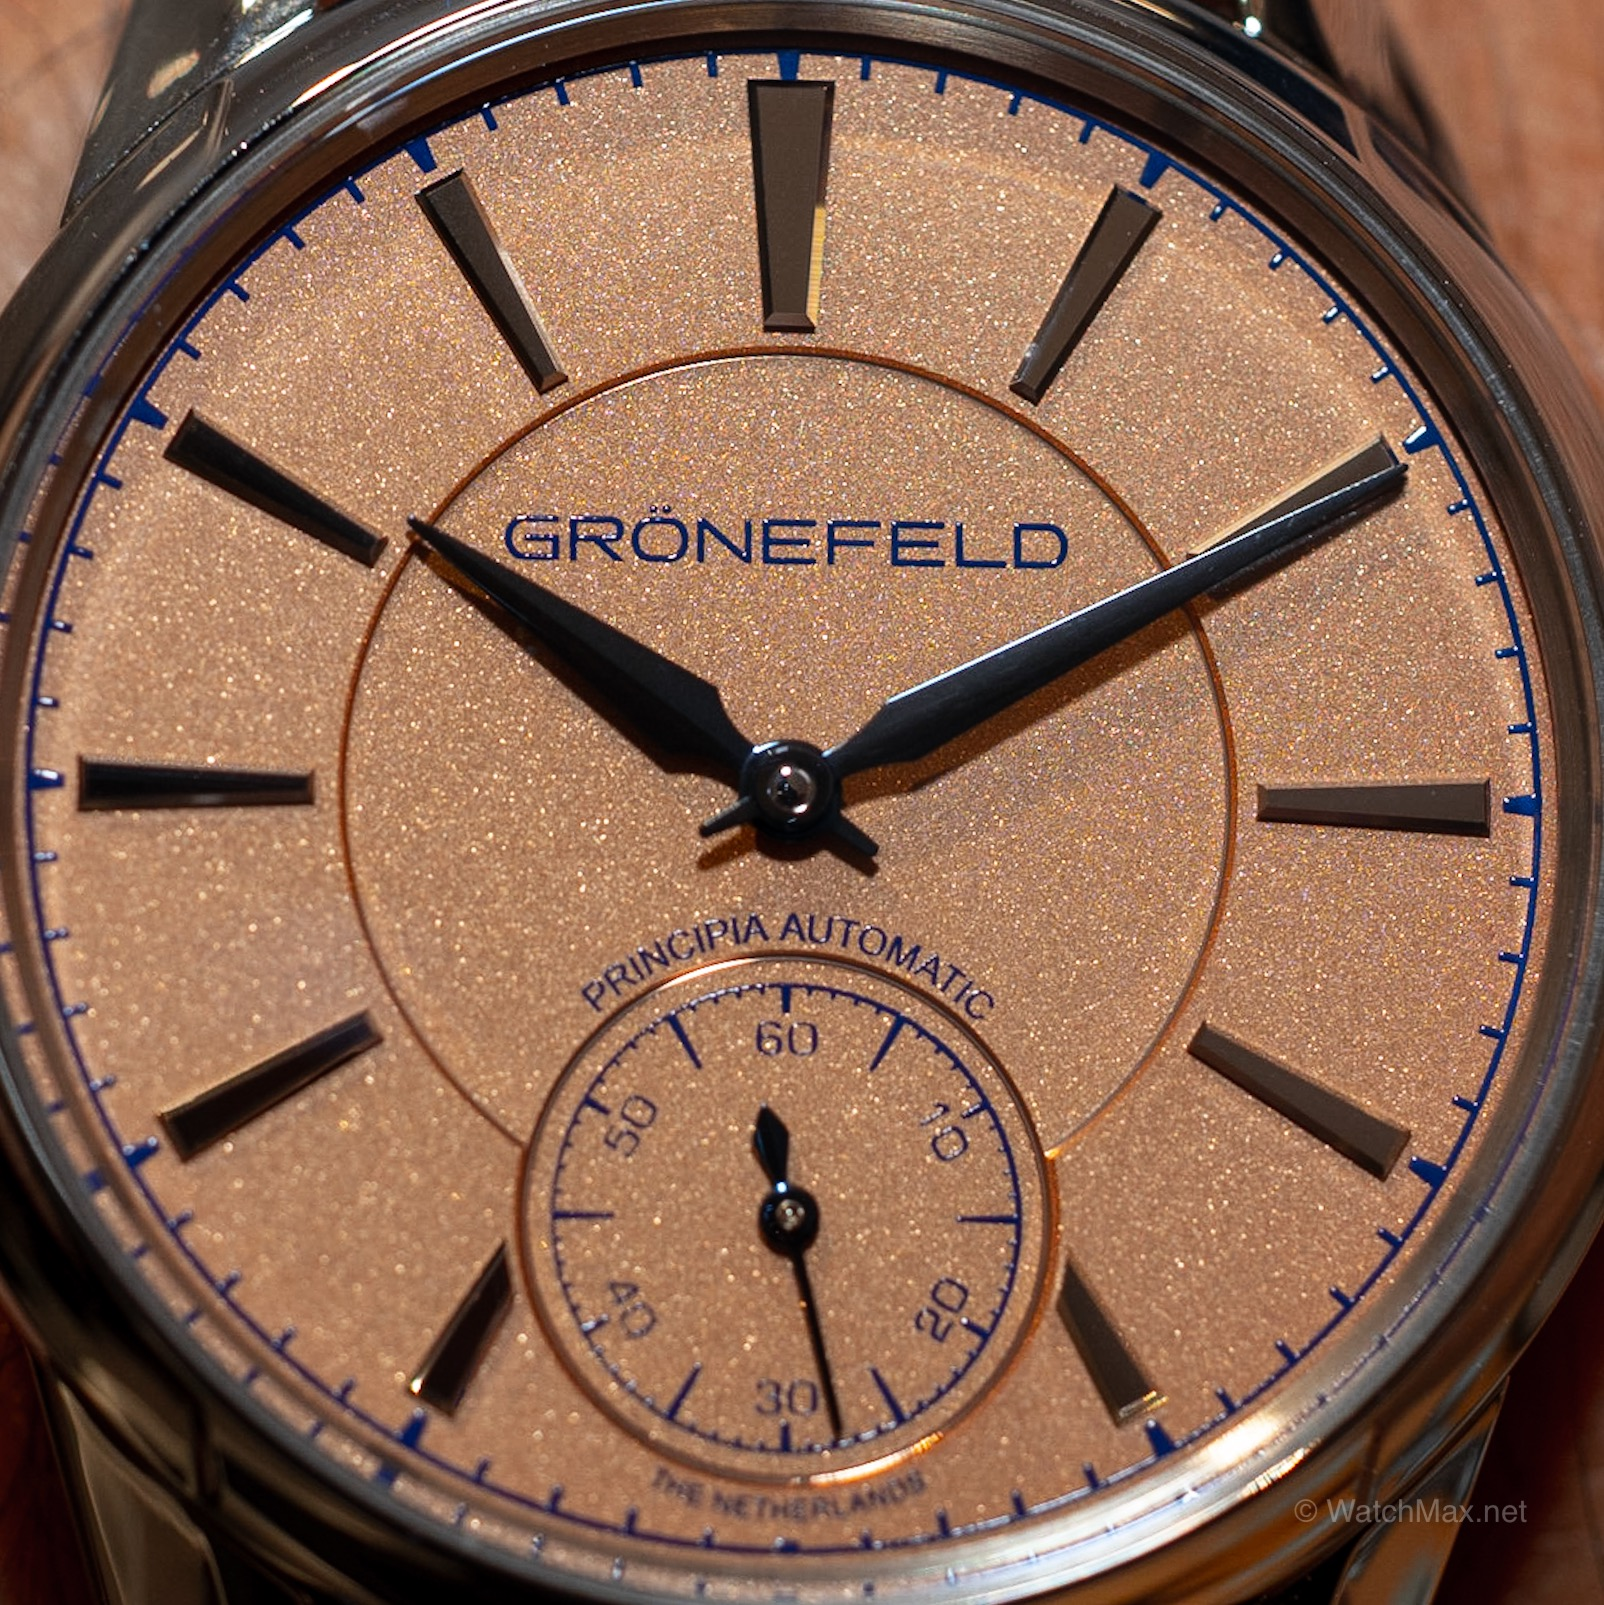 gronefeld-principia-watch-sihh-2019-24.jpg